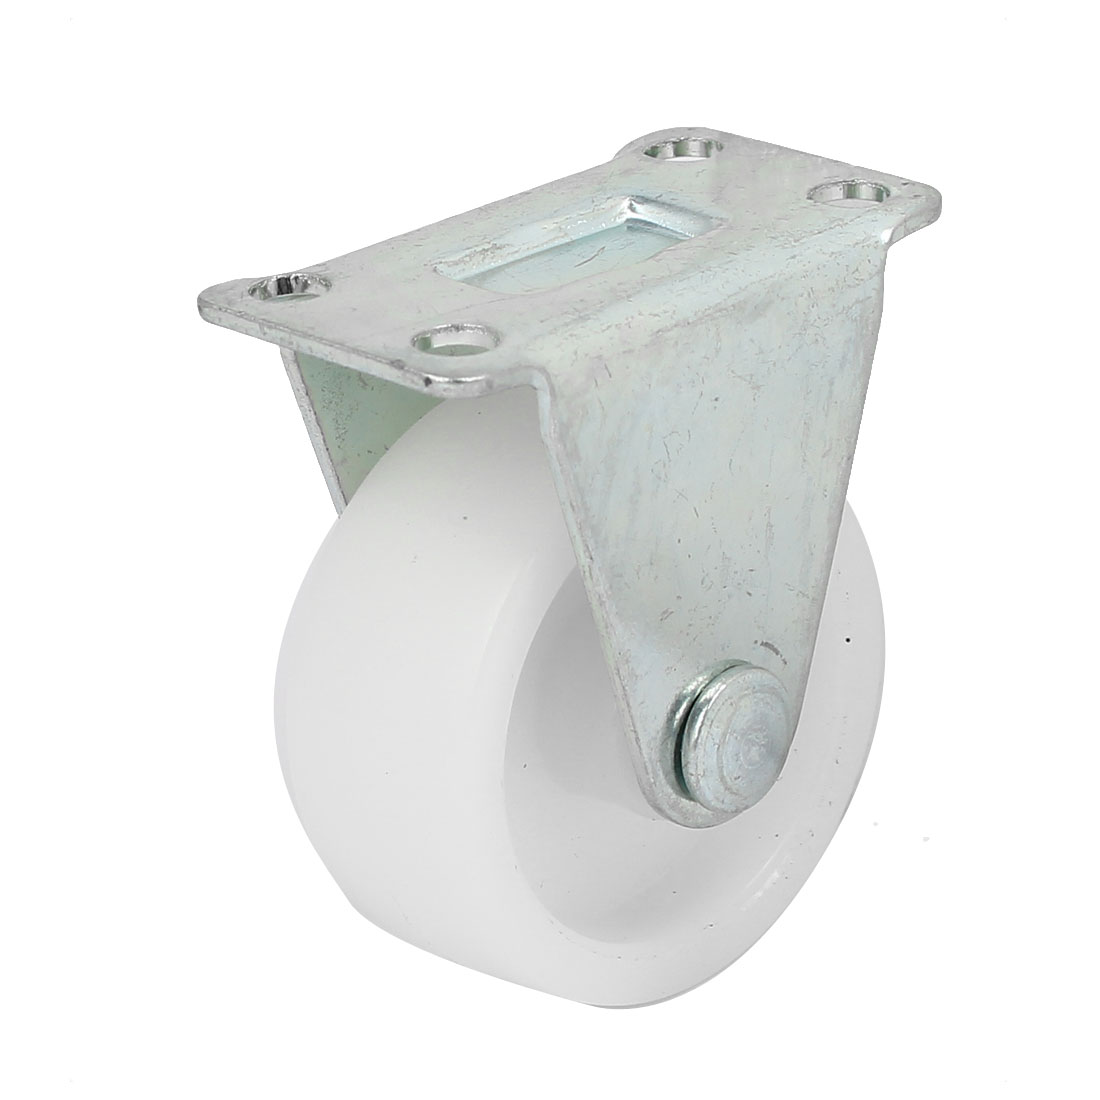 "1.6"" Dia Fixed Type Flat Top Plate Non-Swivel Caster Wheel White"